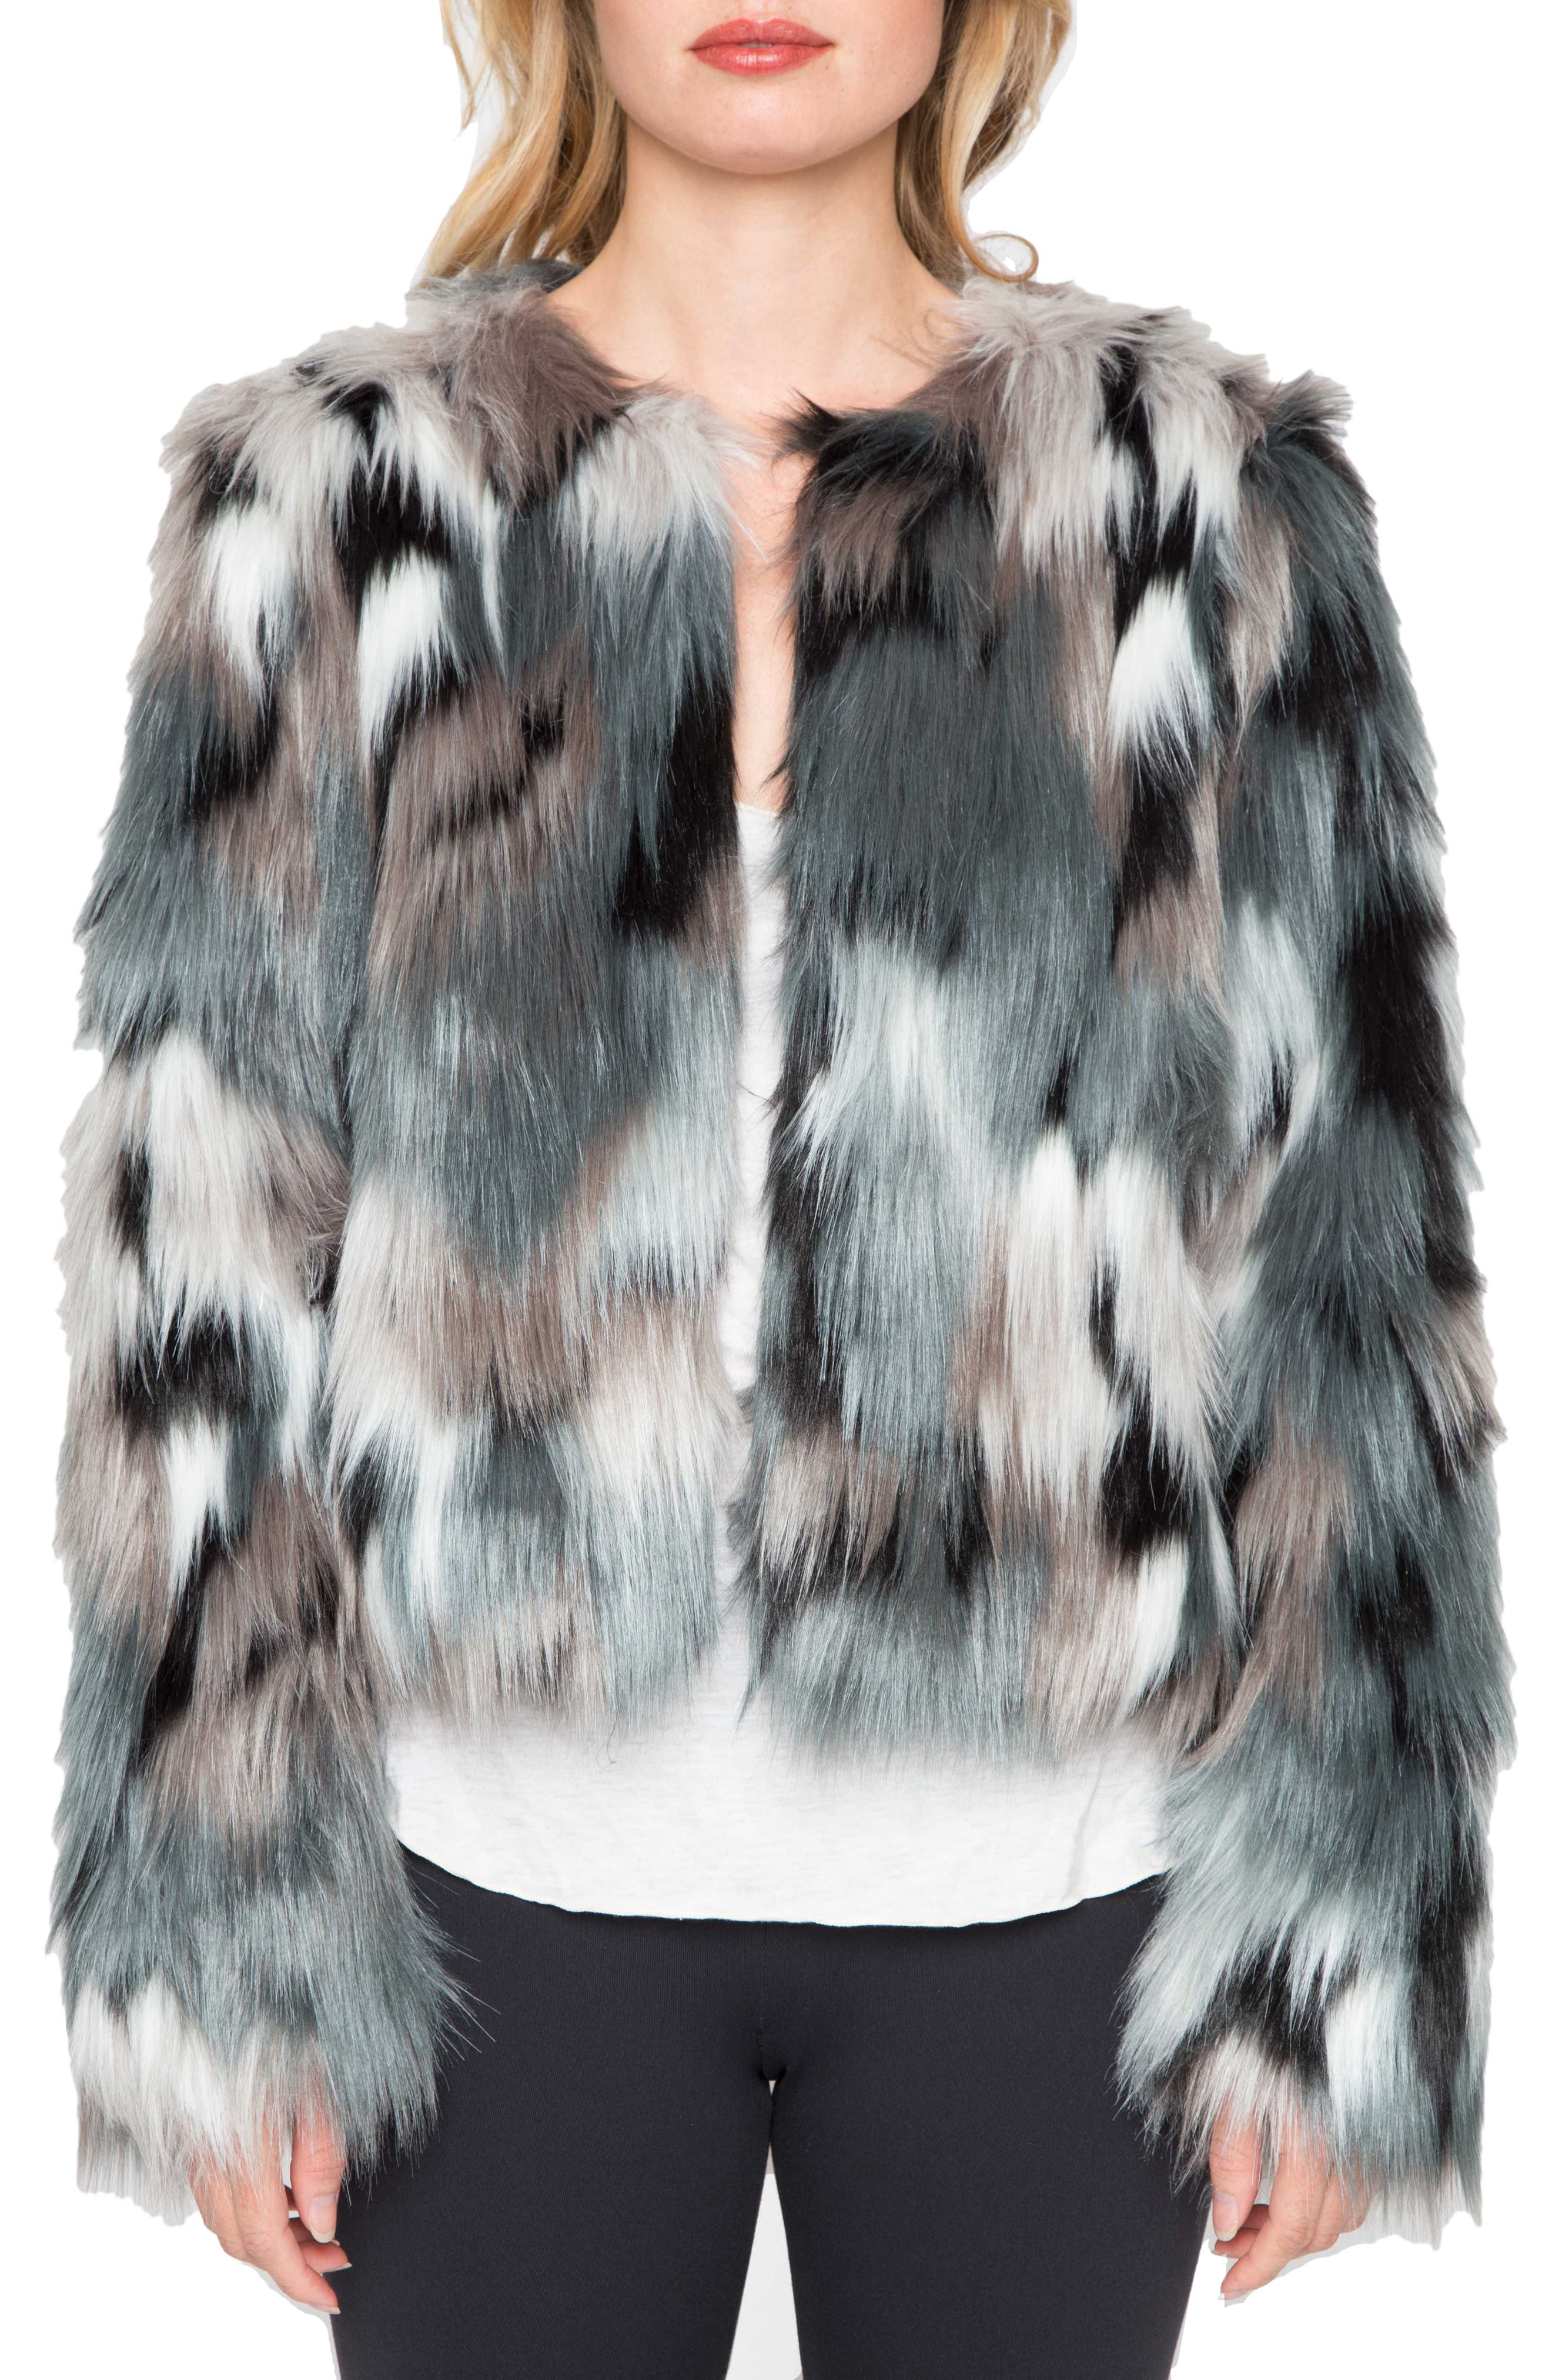 WILLOW & CLAY, Faux Fur Jacket, Main thumbnail 1, color, 445